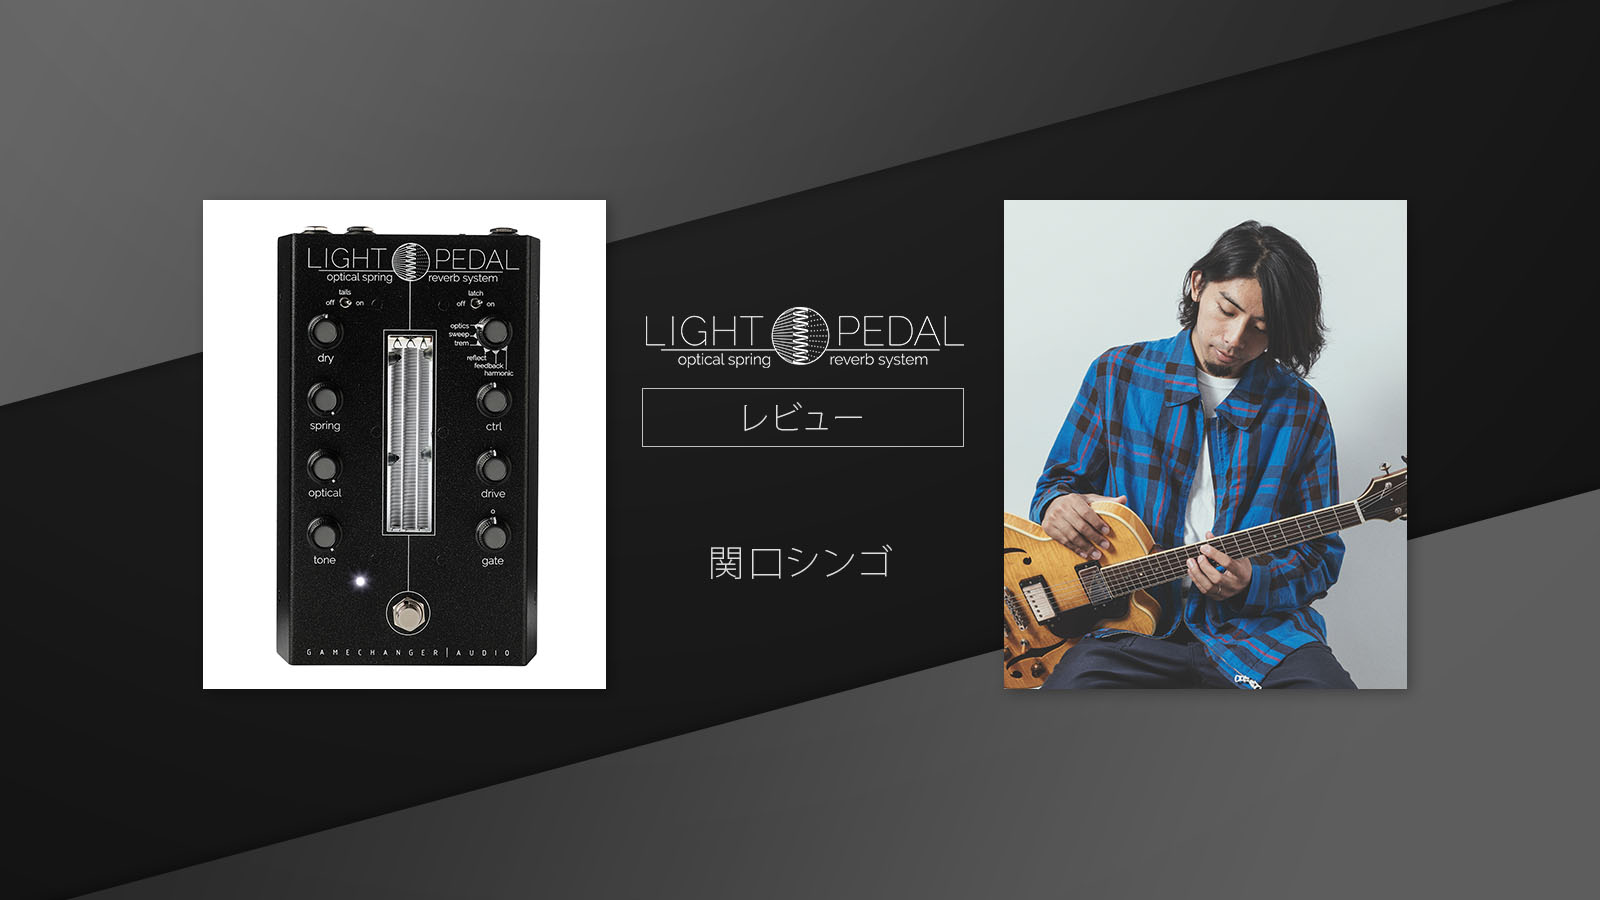 Light Pedal 製品レビュー : 関口シンゴ